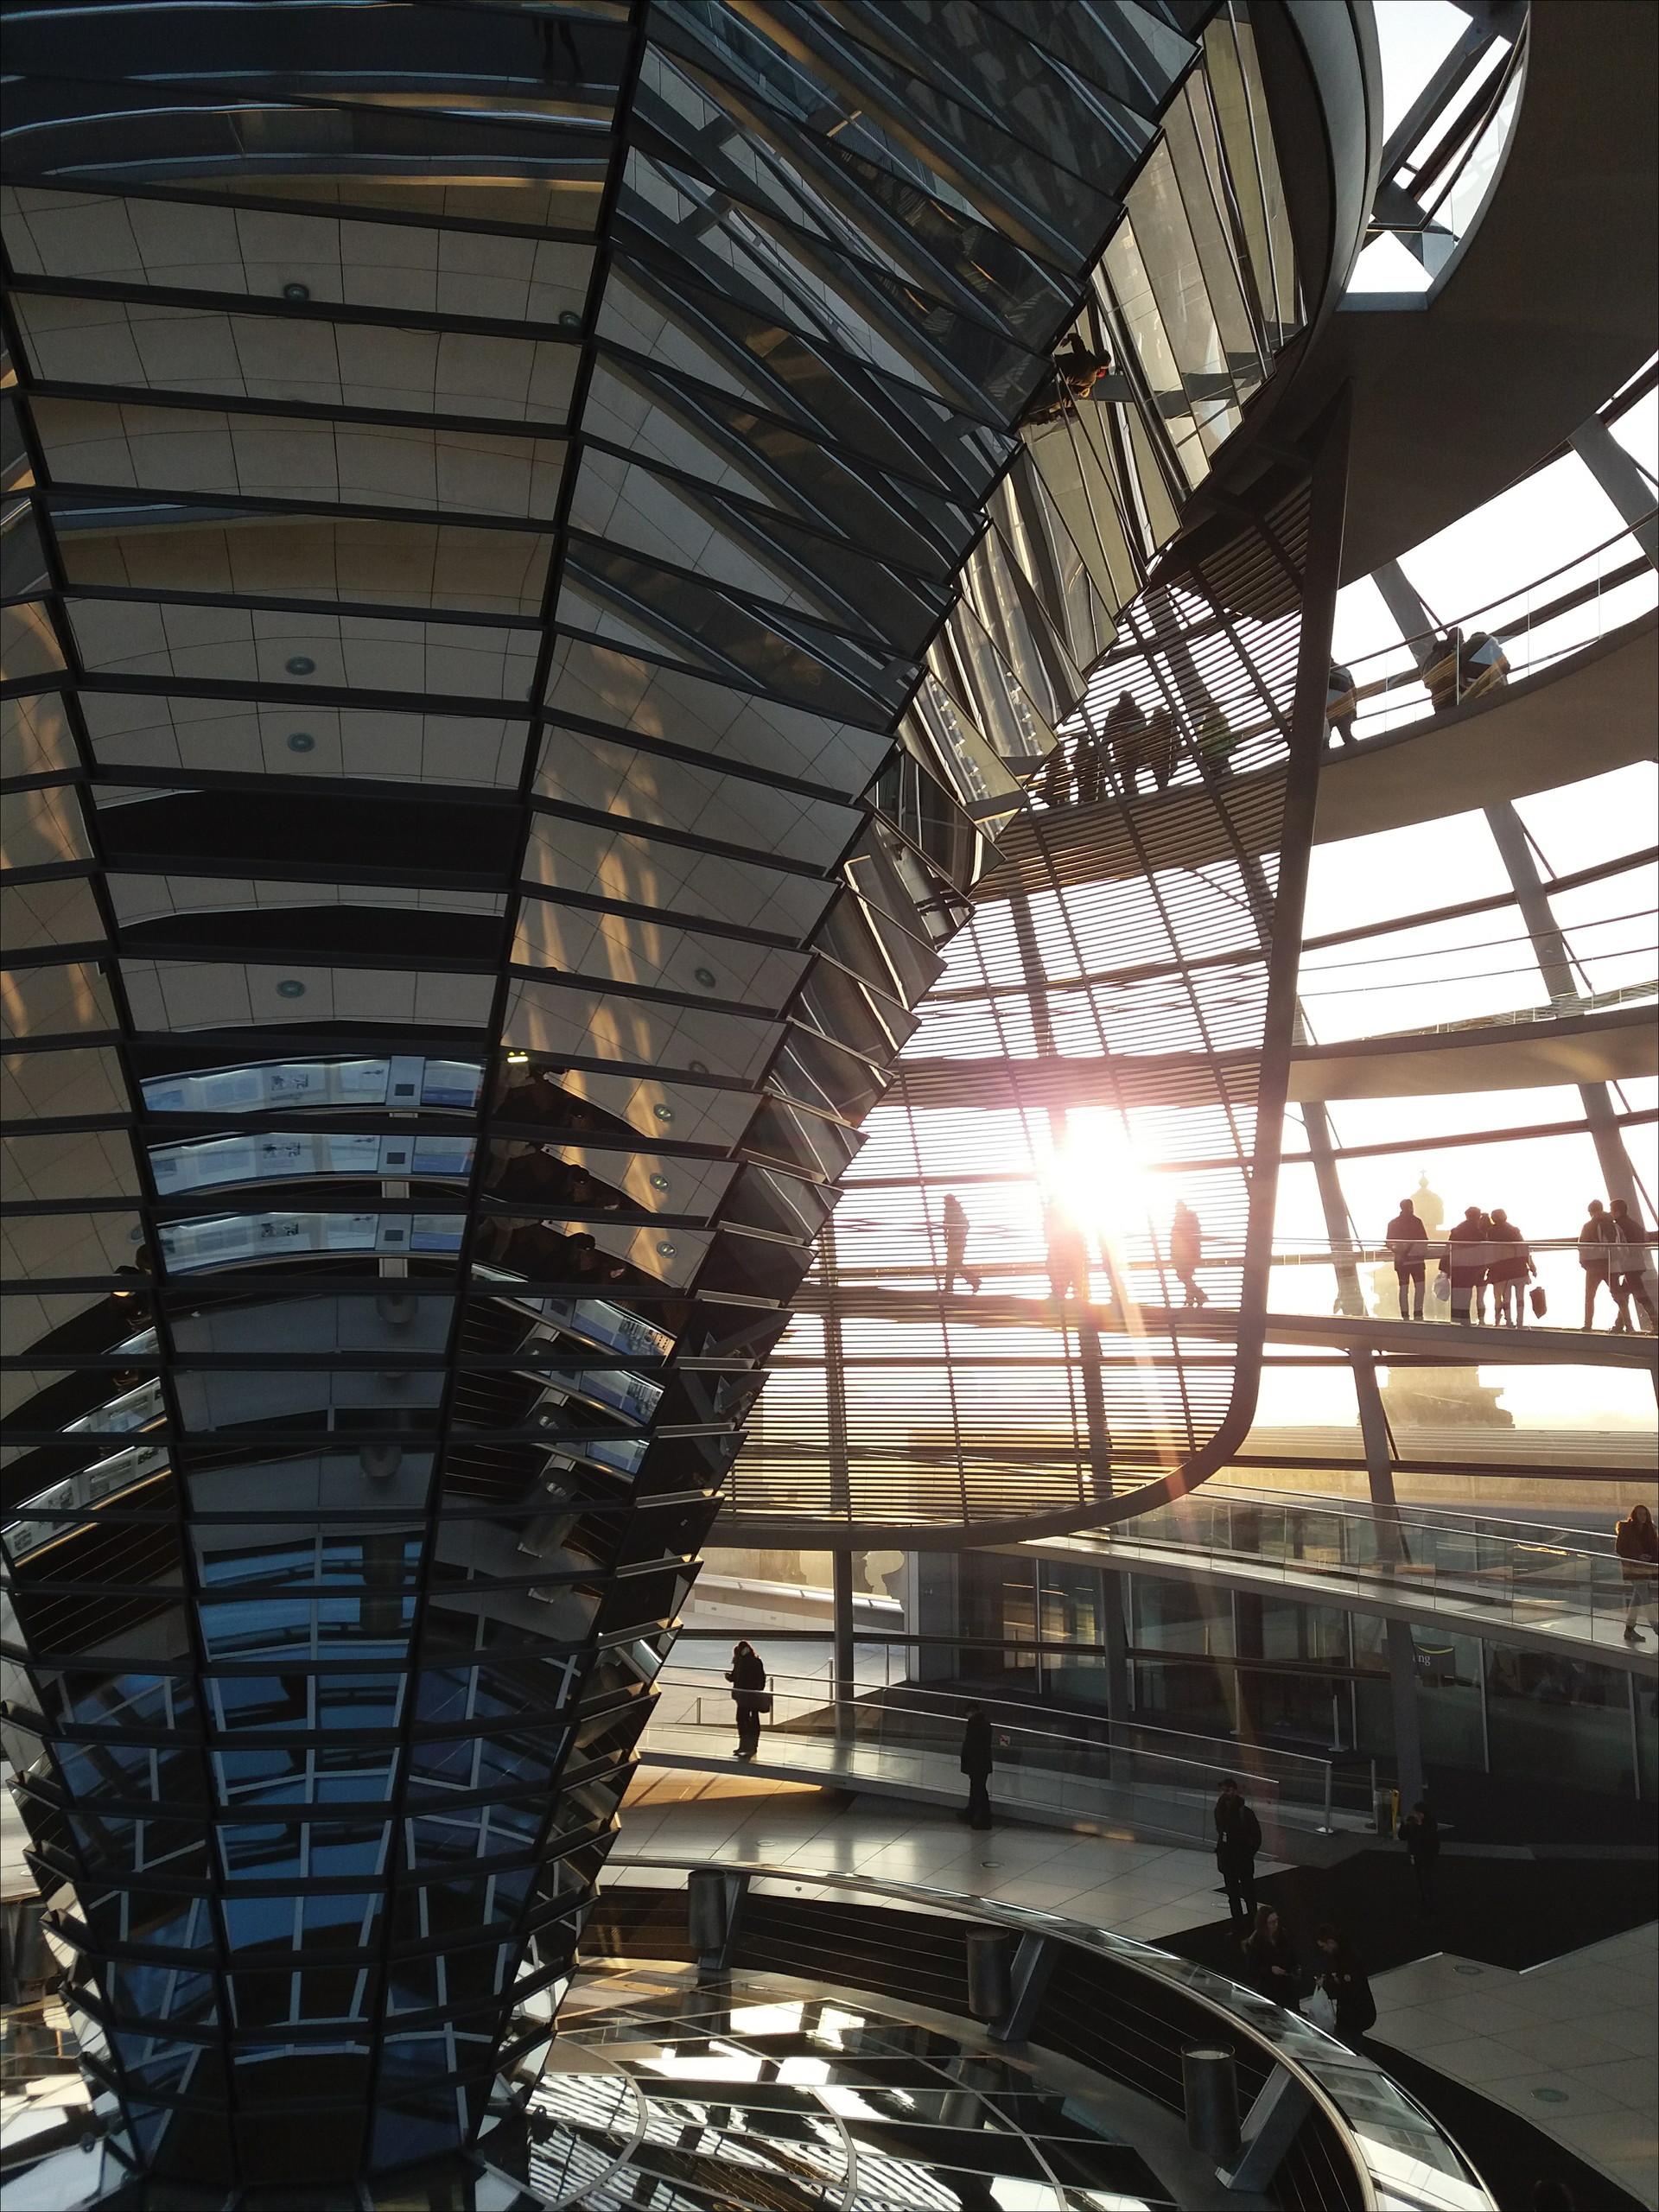 Berlim, Colónia e Estugarda